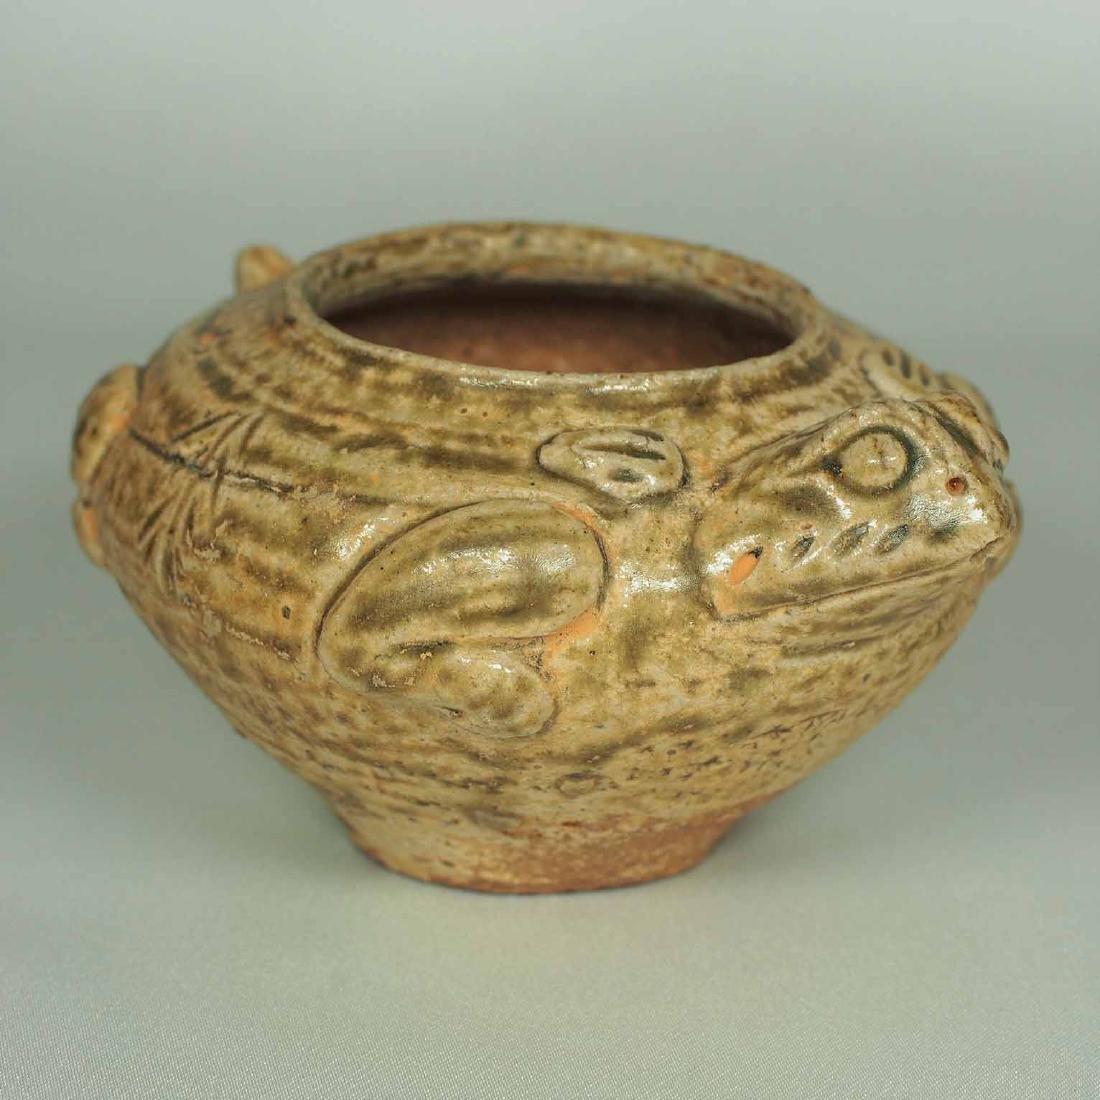 Proto-Porcelain Turtle-Form Water Pot, Han Dynasty